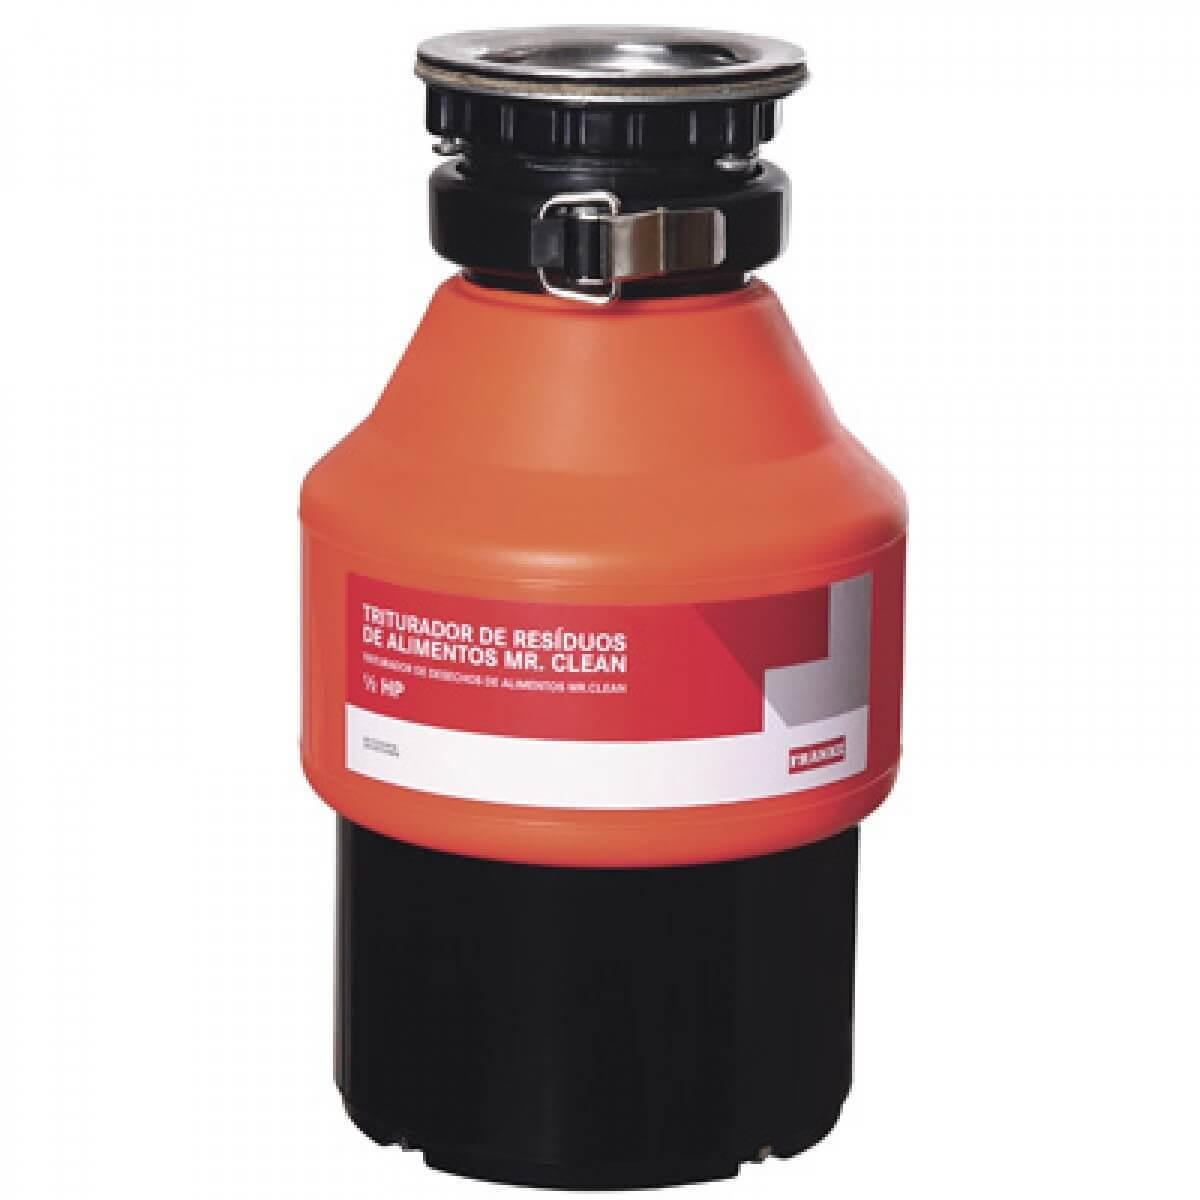 Triturador de Resíduos de Alimentos Mr. Clean 220V - 09356 - Franke